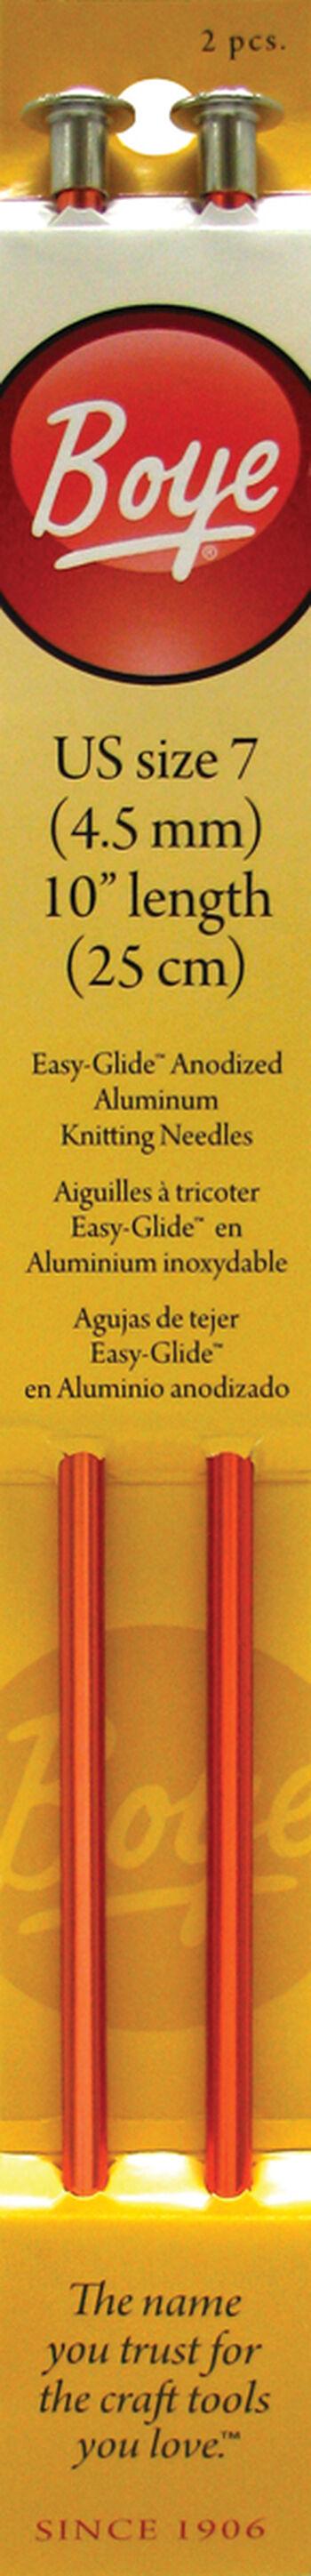 "Single Point Aluminum Knitting Needles 10""-Size 7/4.5mm"